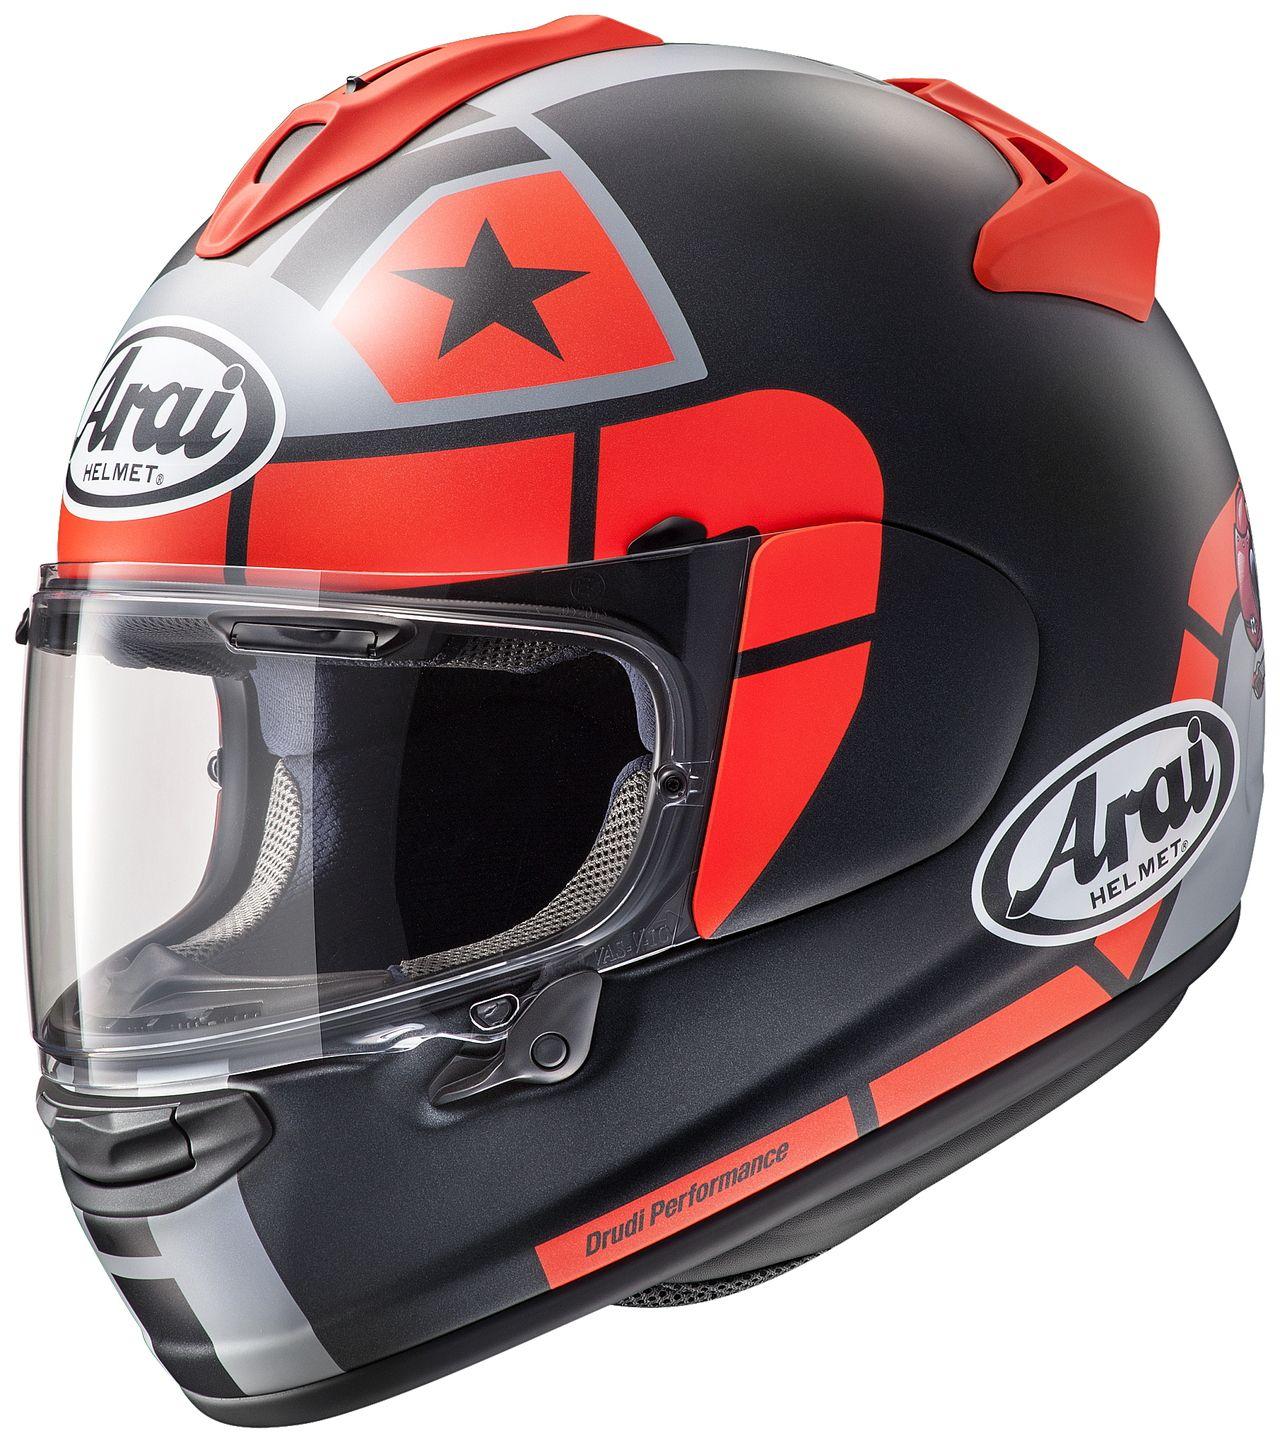 Mũ bảo hiểm hãng ARAI Helmet